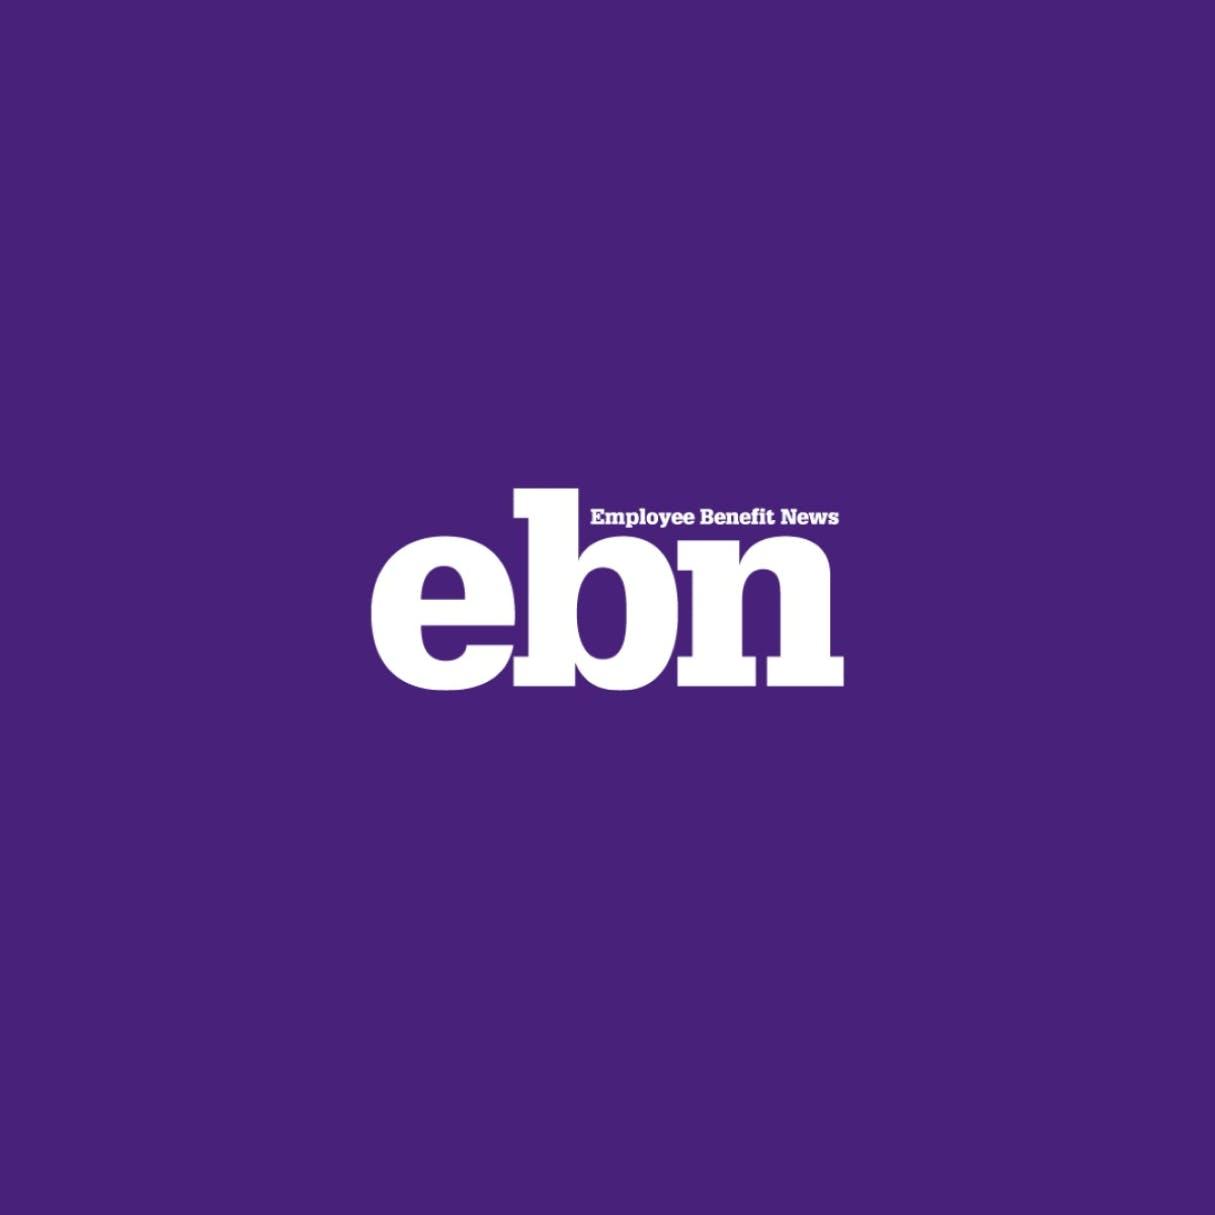 Employee Benefit News Logo